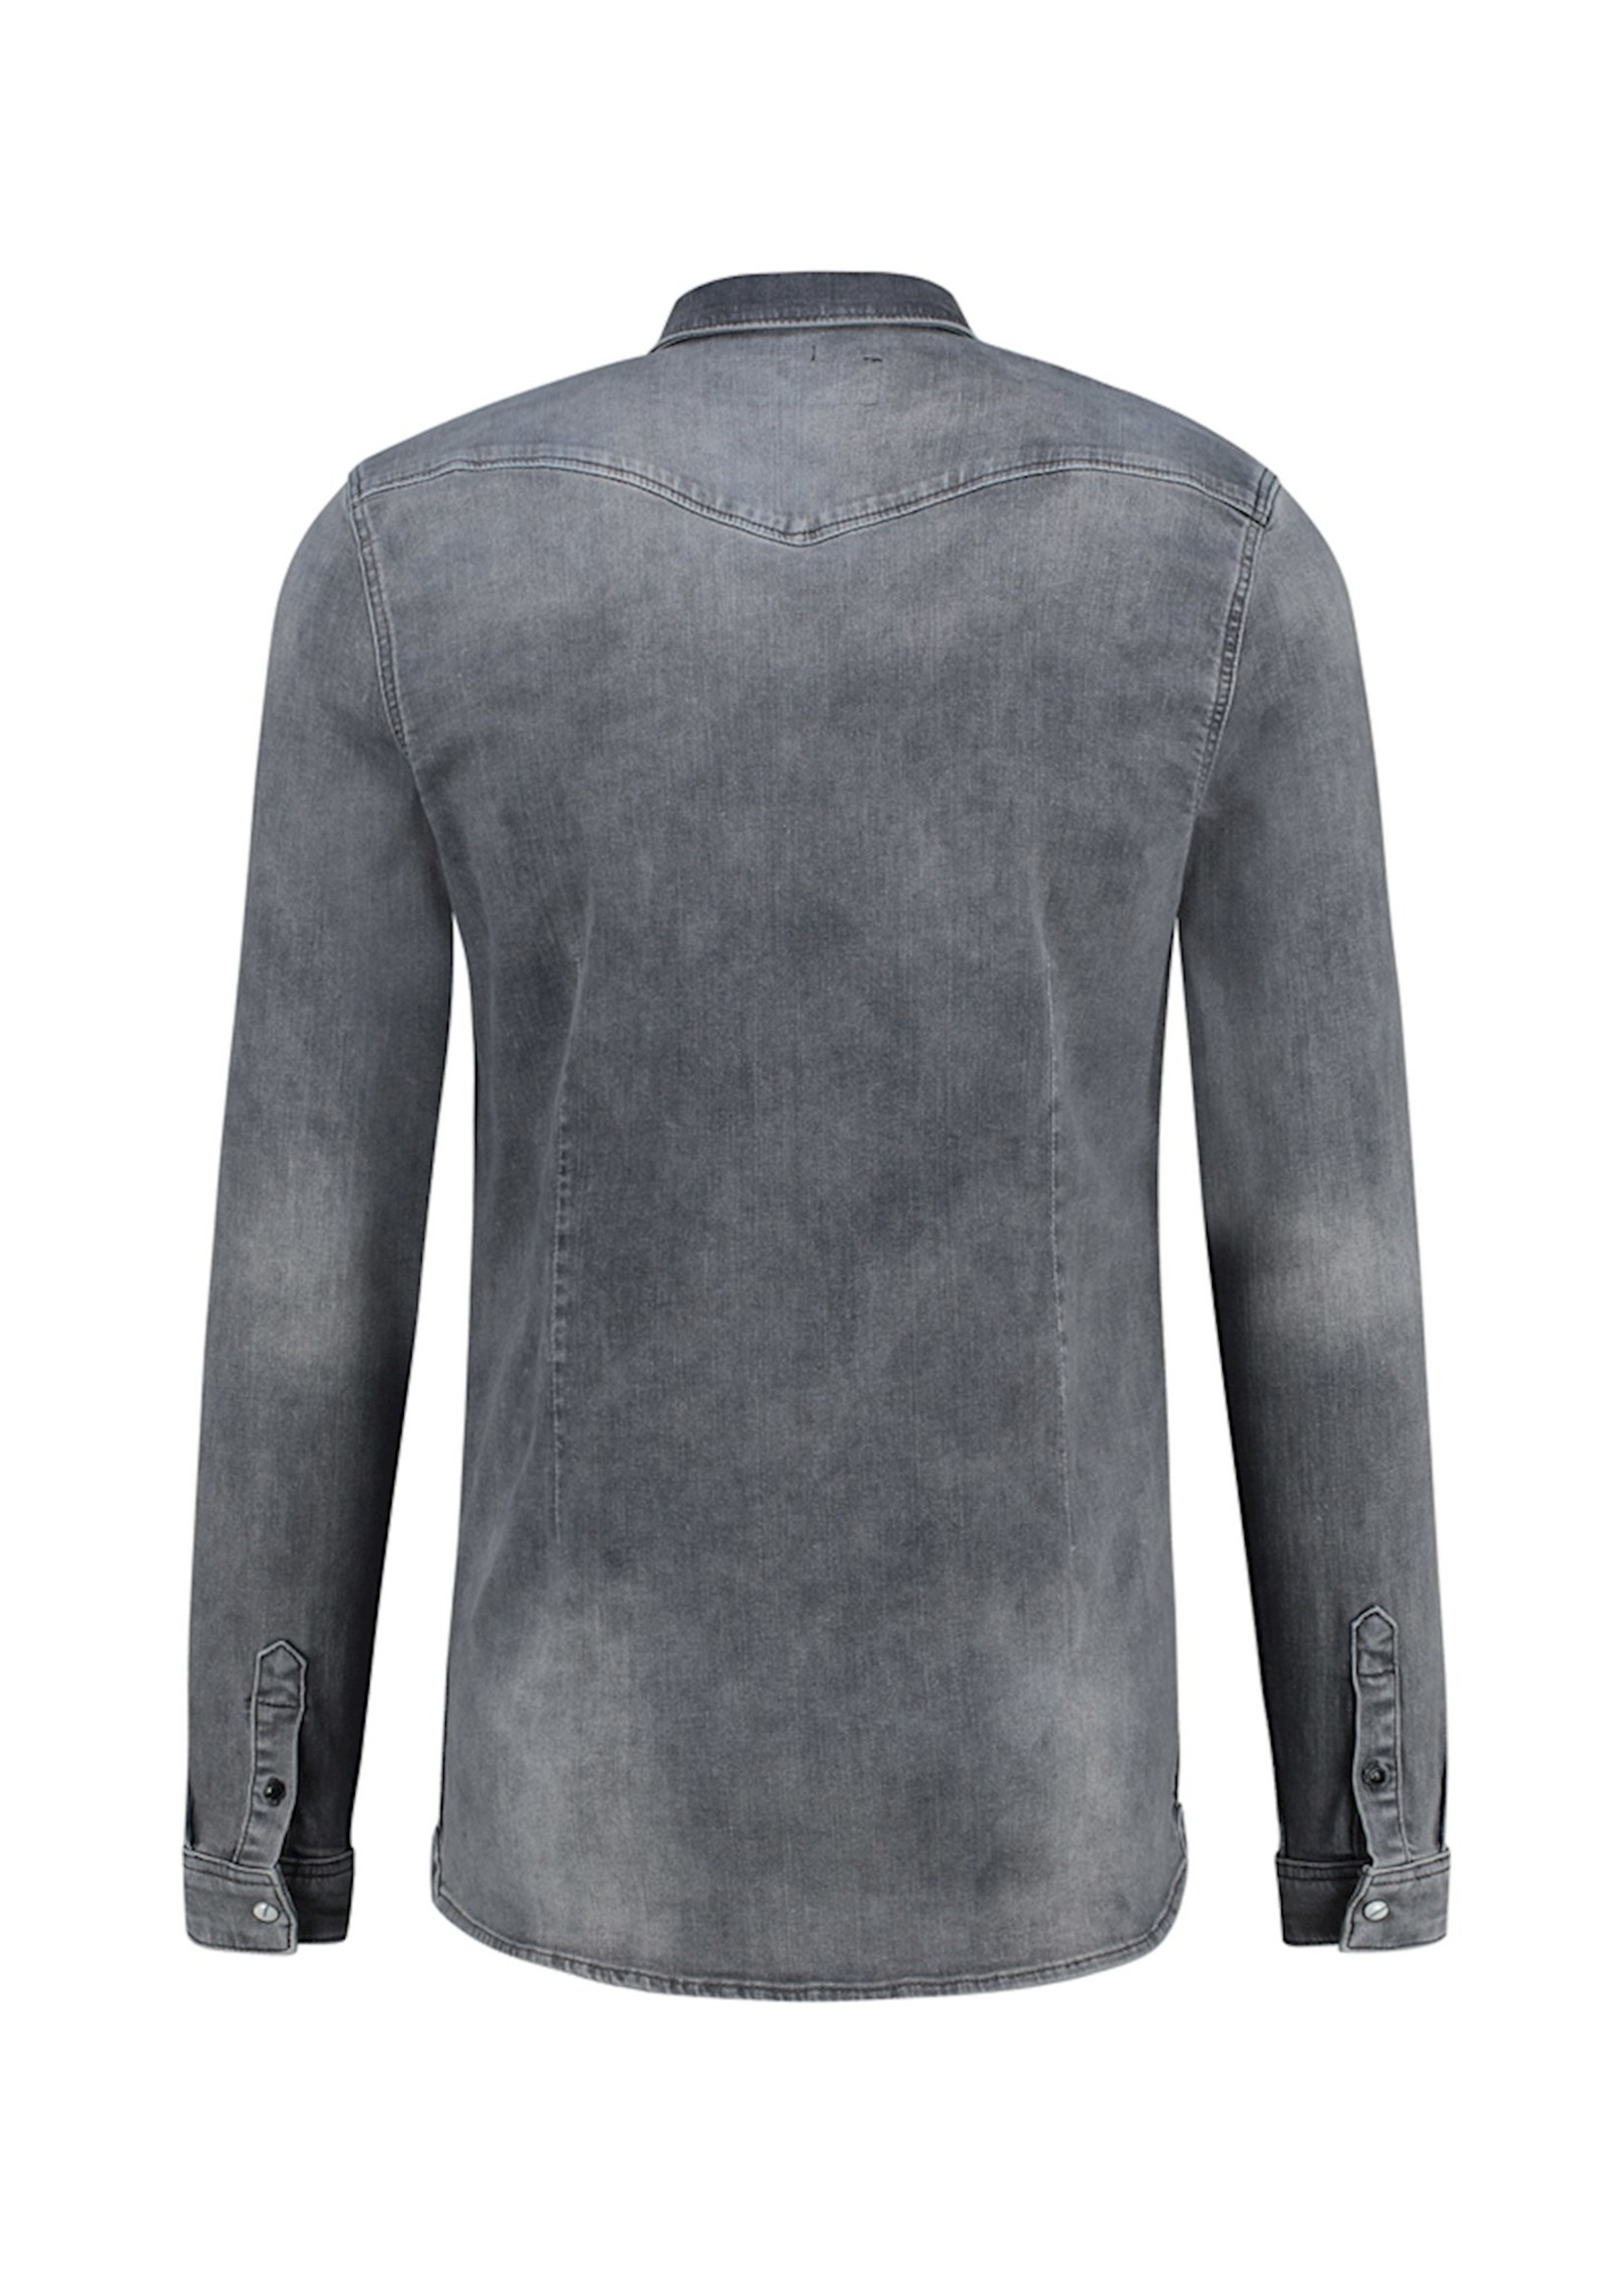 Purewhite Denim Shirt - Mid Grey